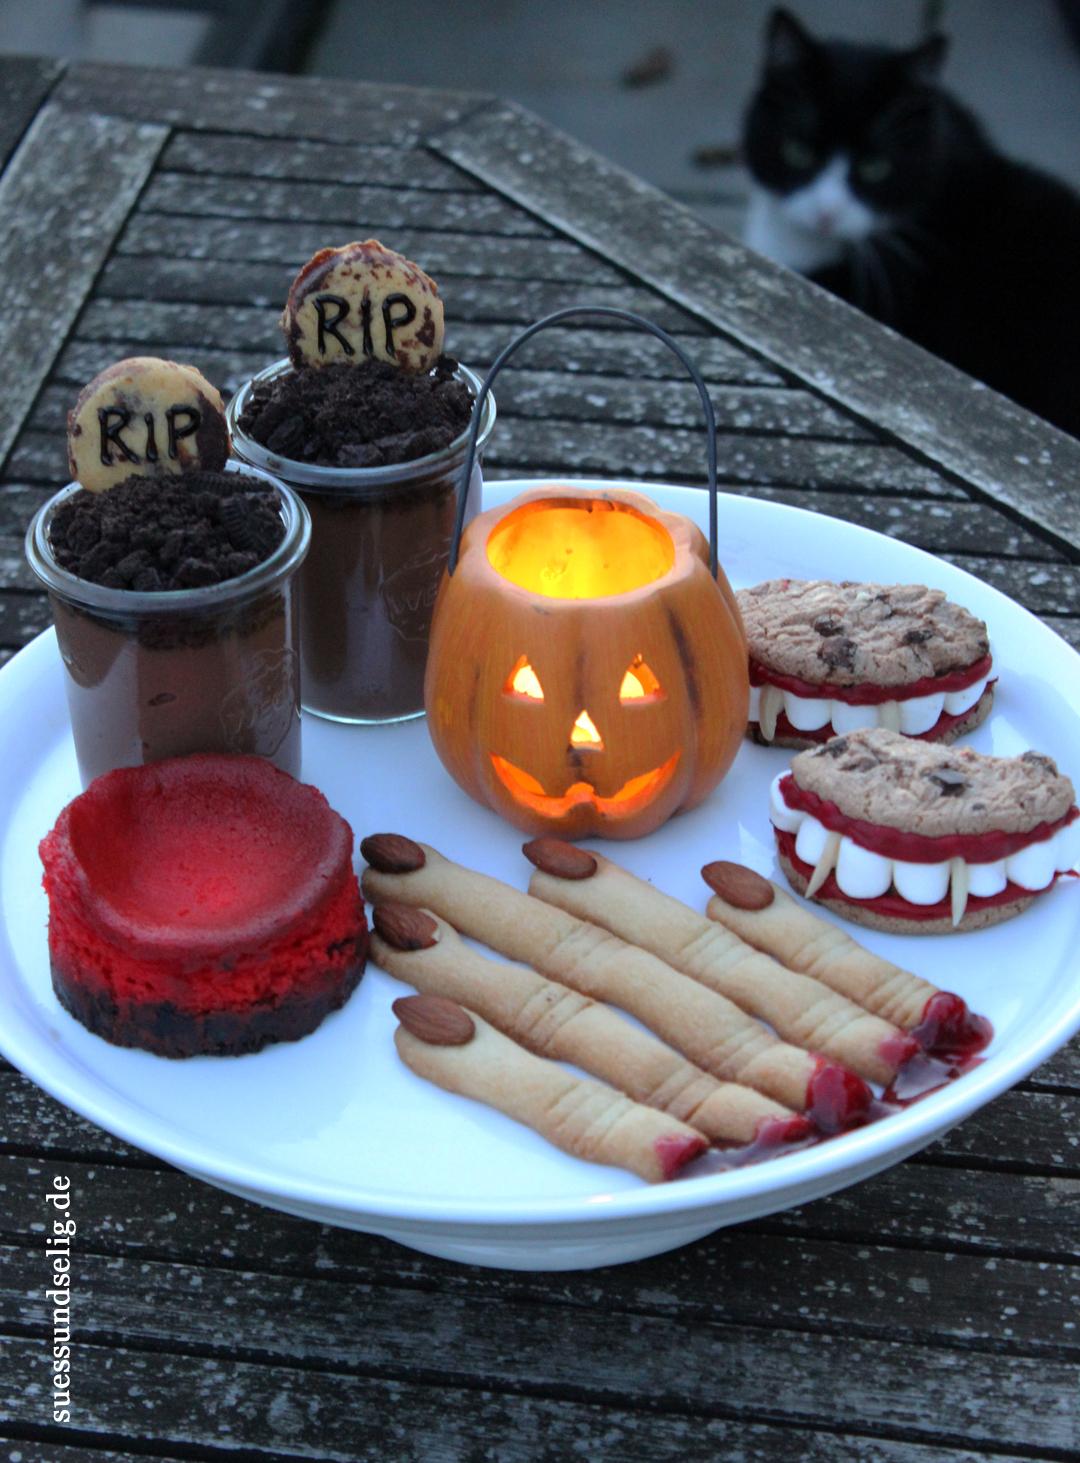 halloween gruselig s e desserts und snacks teil 2 suessundselig. Black Bedroom Furniture Sets. Home Design Ideas